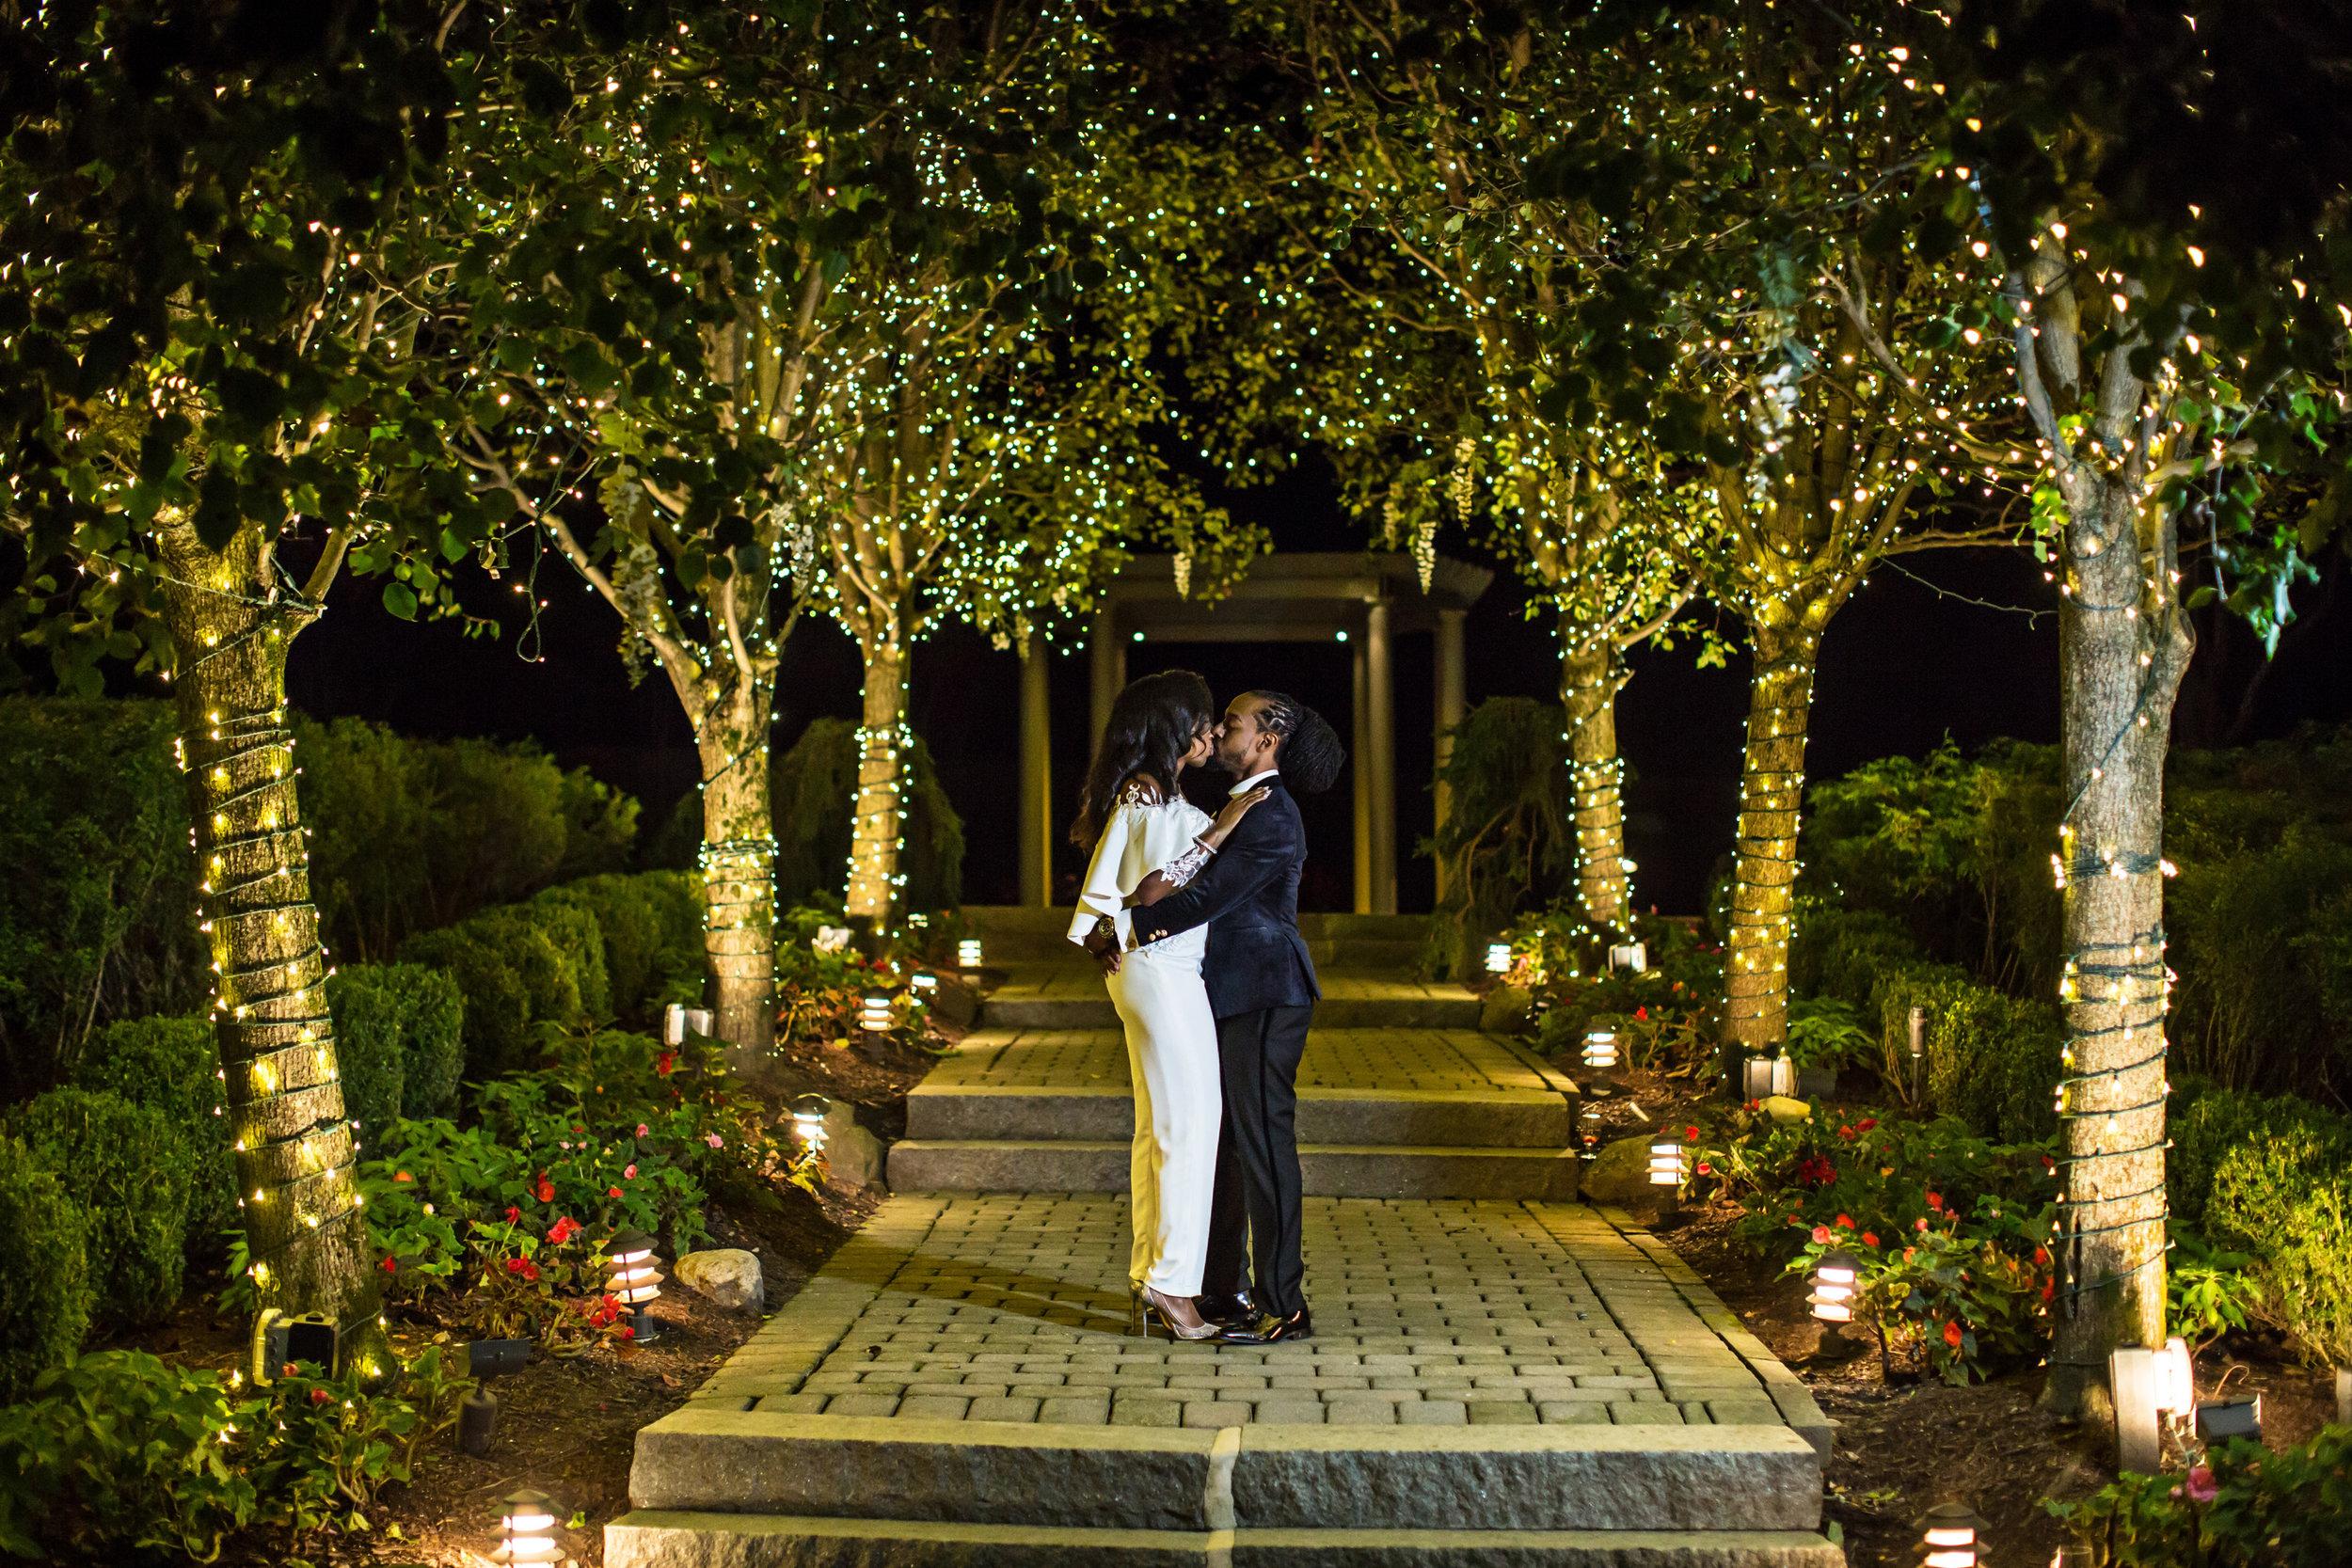 victorious-events-nyc-036-romie-kamali-tides-estate-wedding-nana-annan.jpg